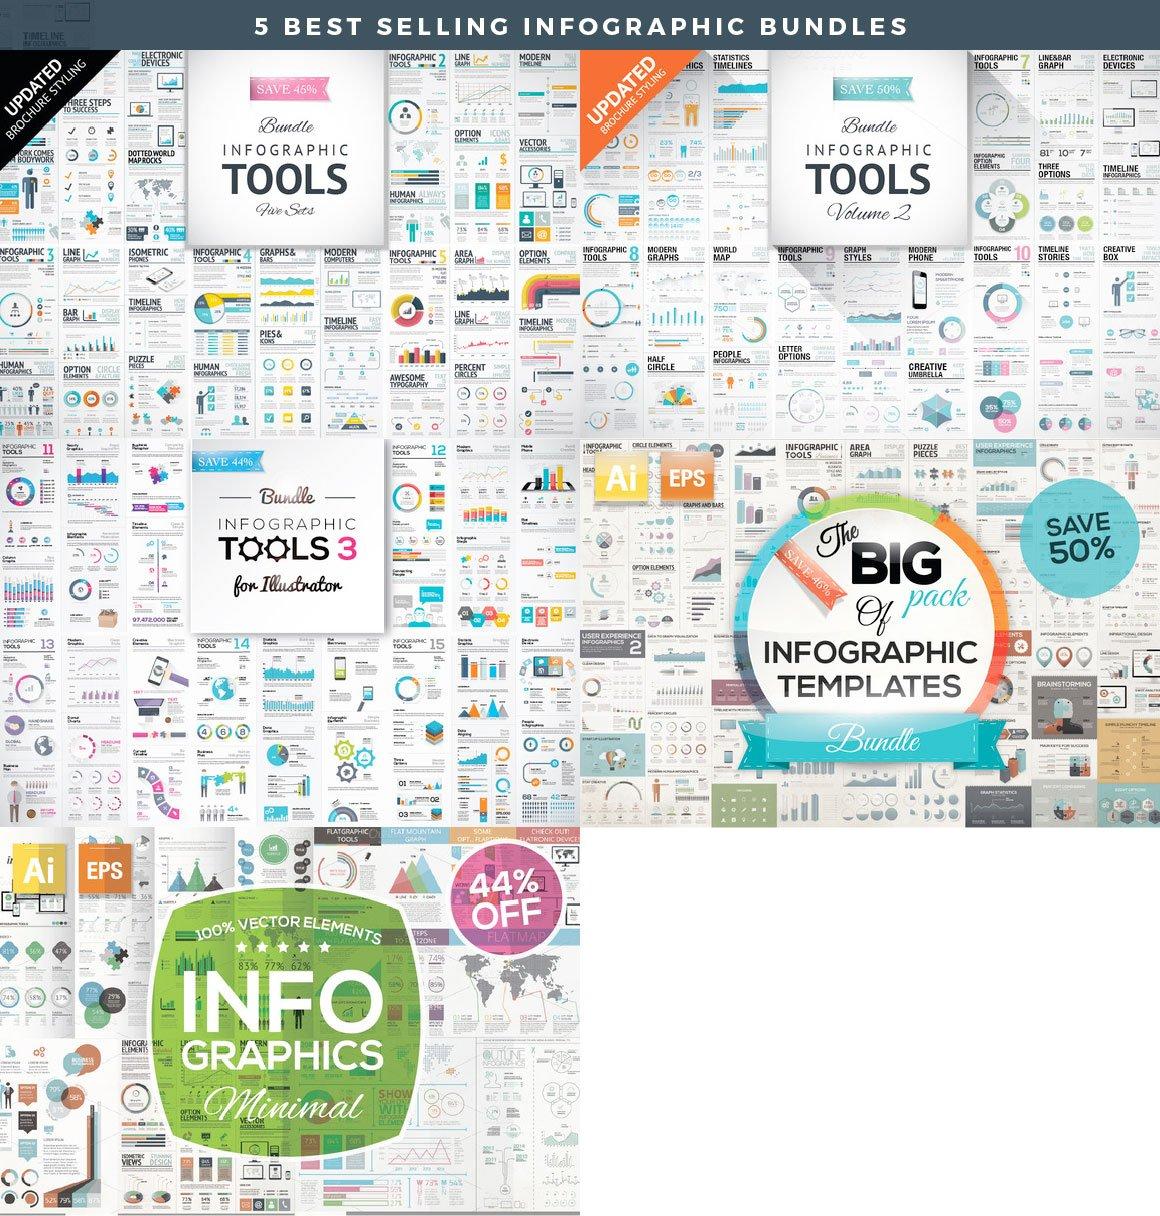 Infographic Mega Bundle - cover2 1 -